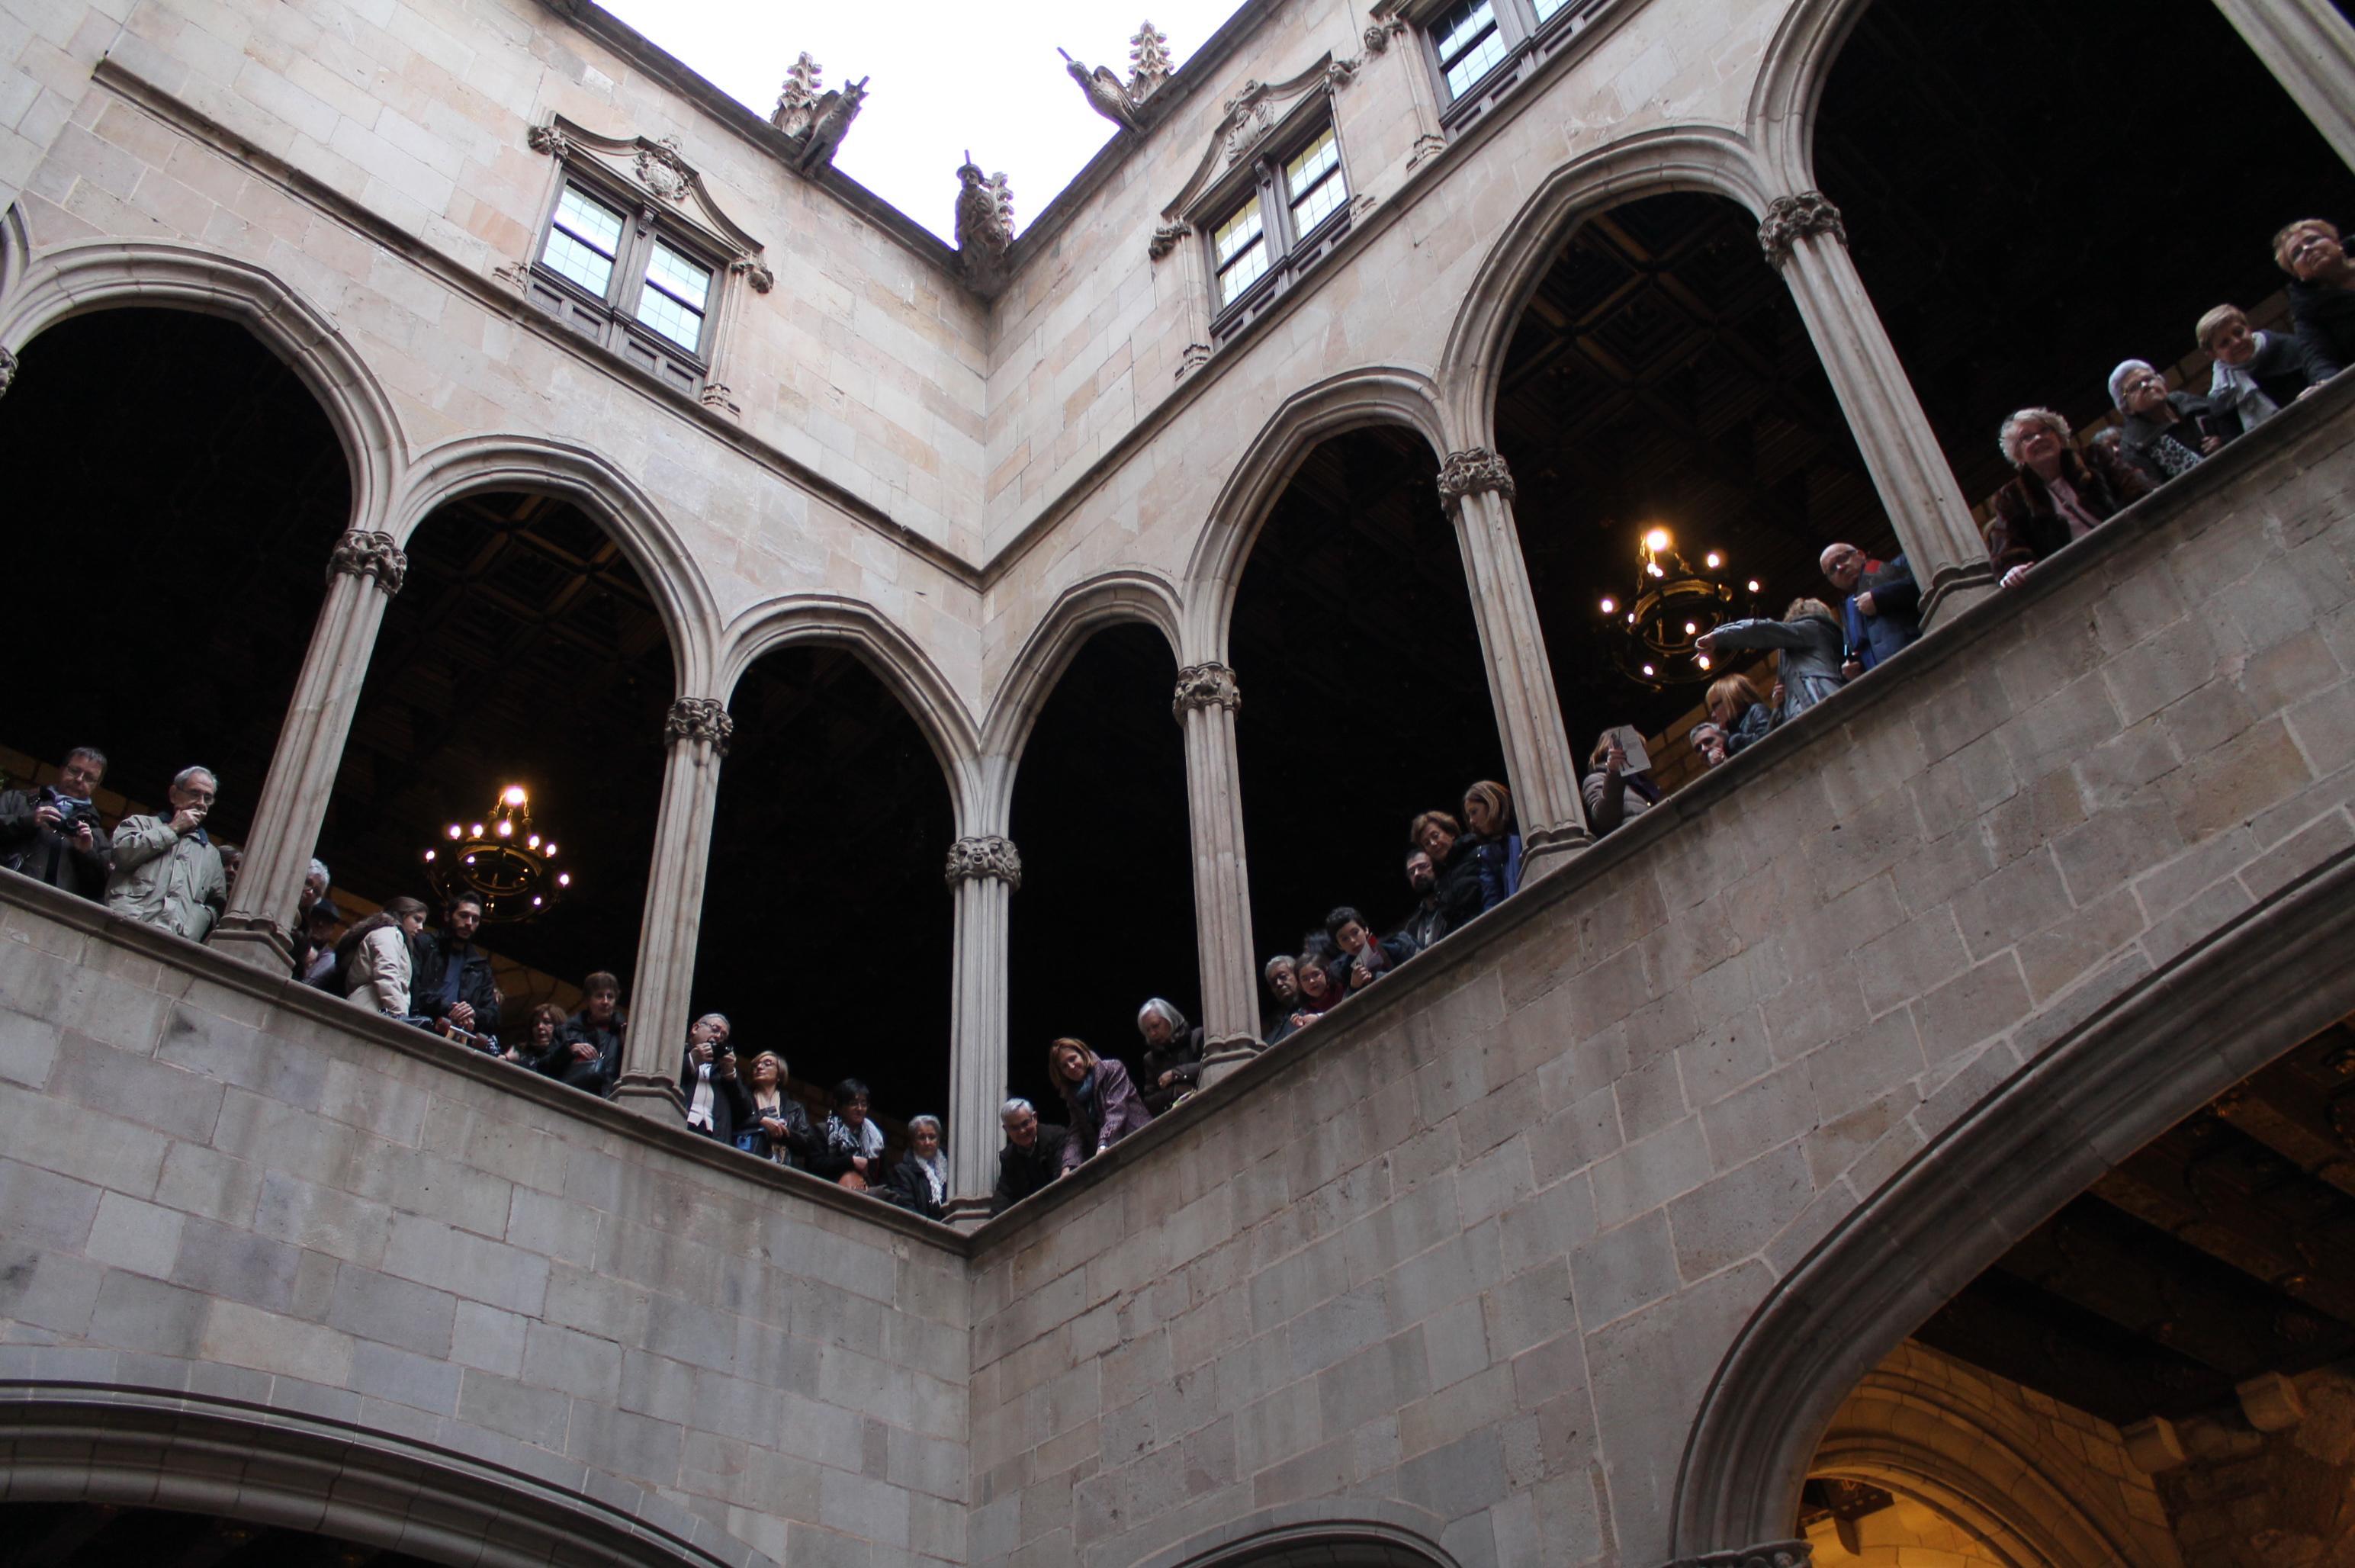 Tradition and history return to the santa eullias day festivities barcelona city council with - De gasperi santa maria di sala ...